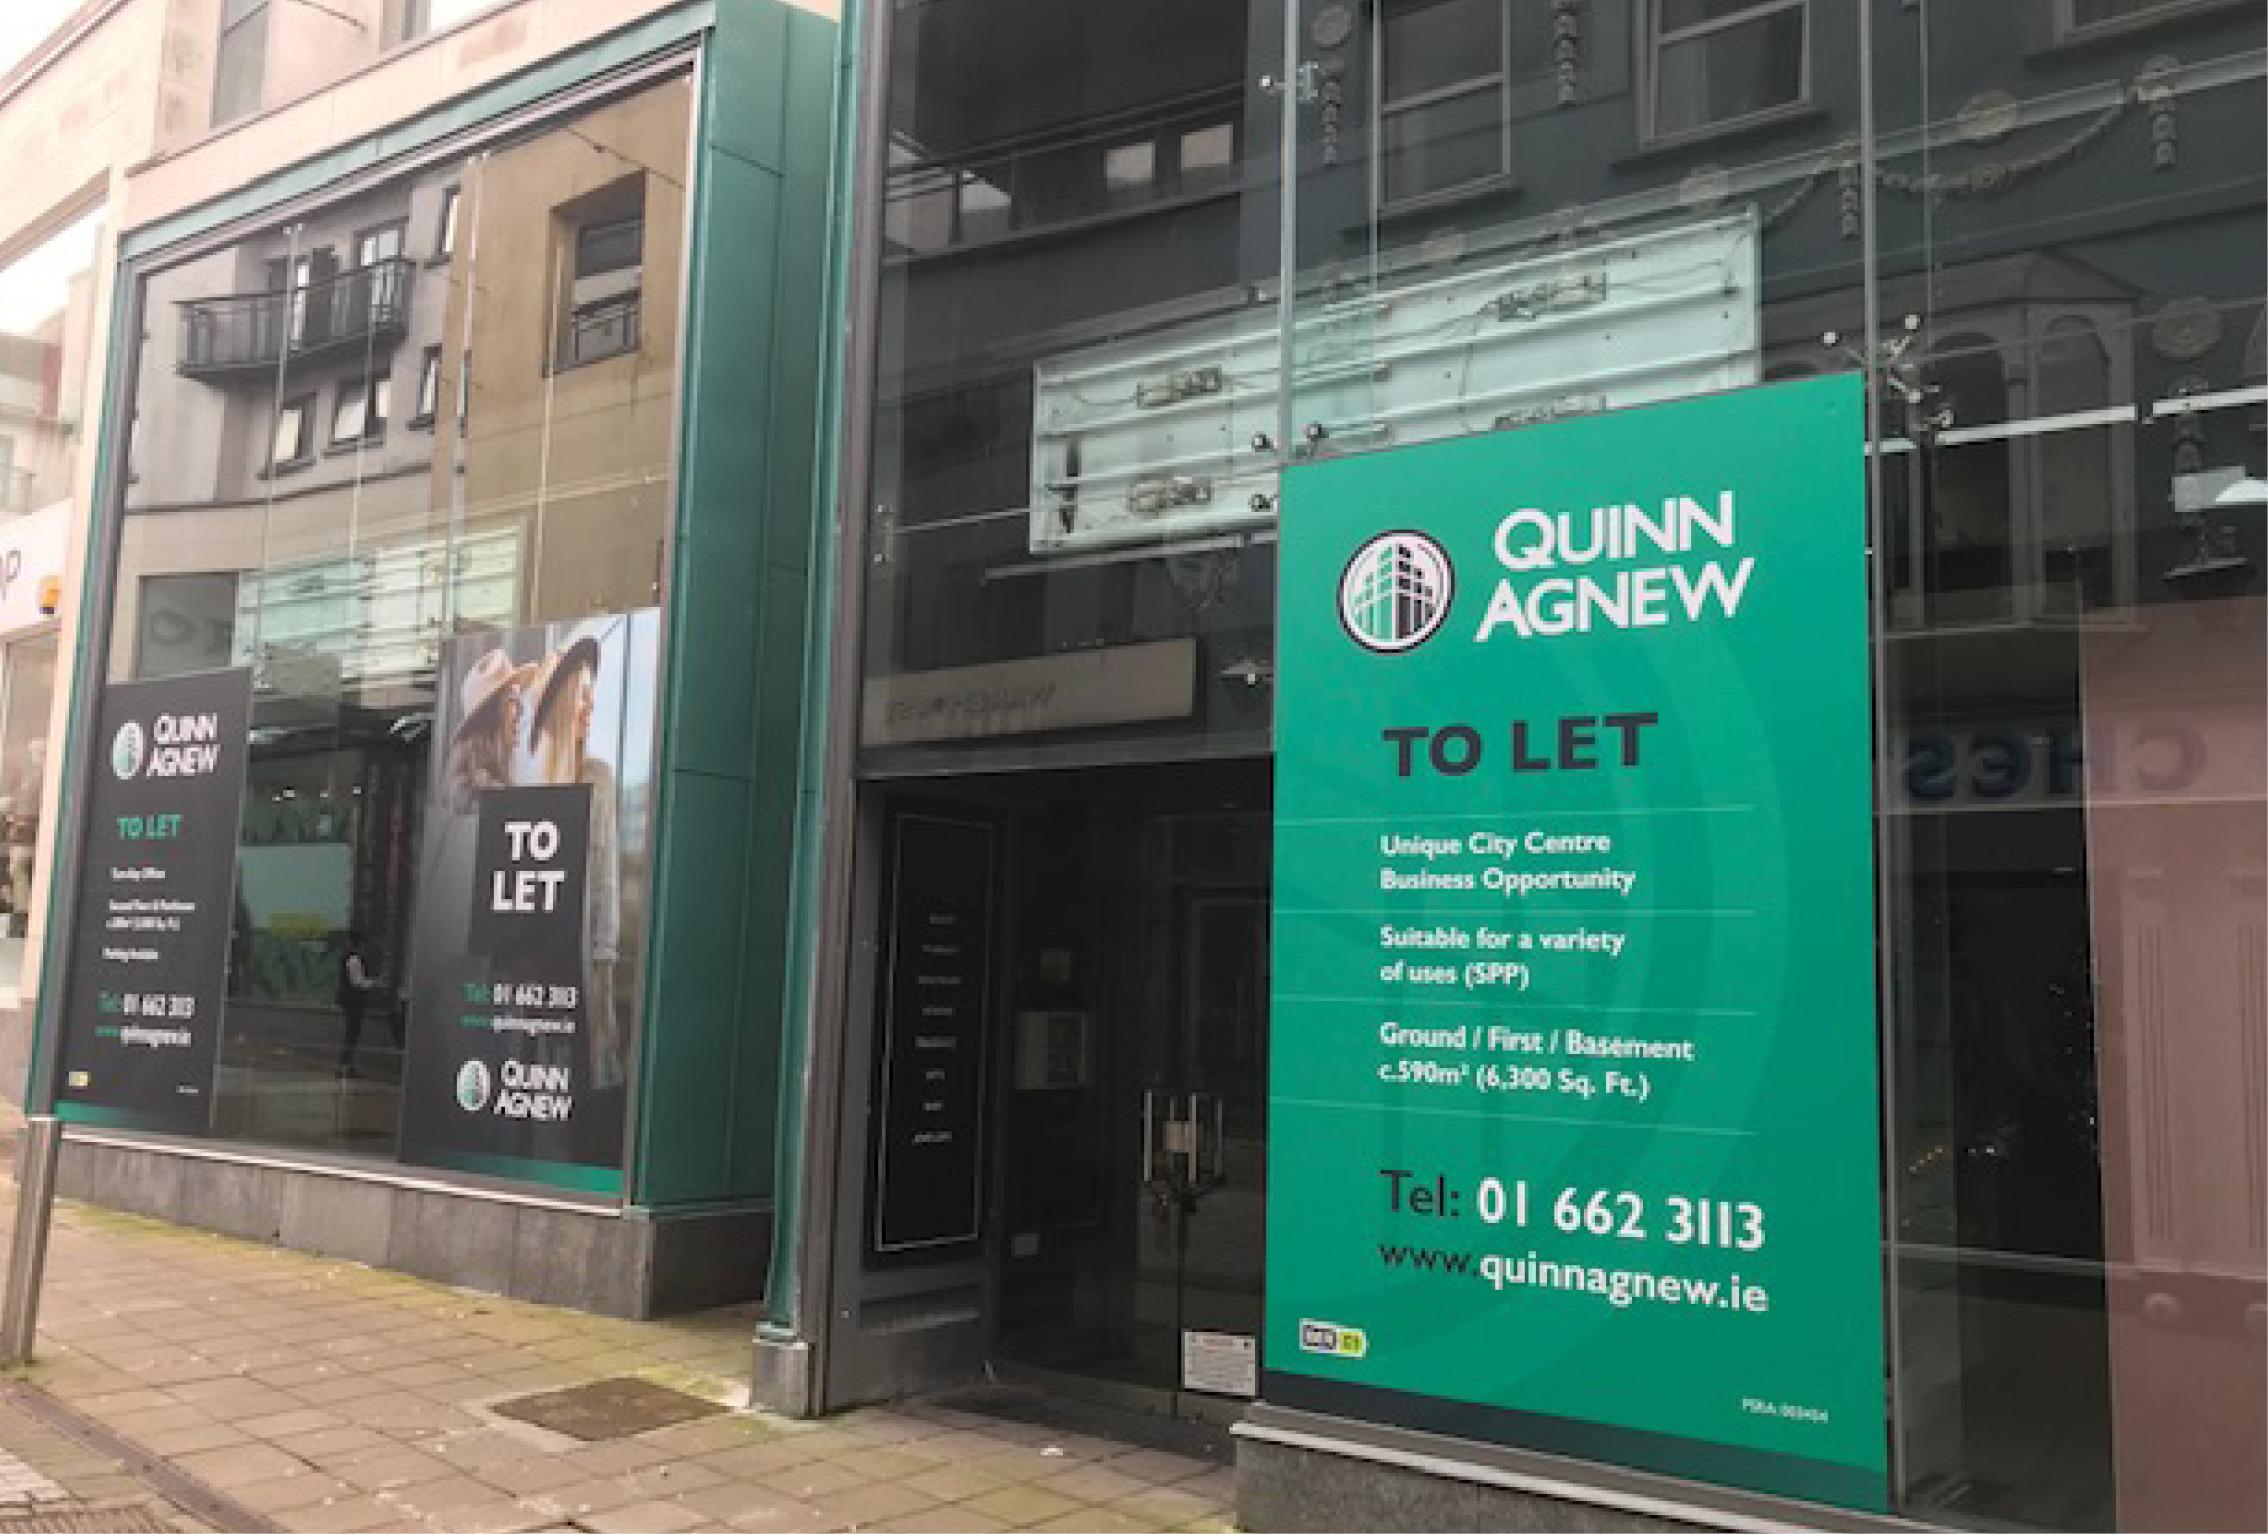 Quinn Agnew Window Graphic